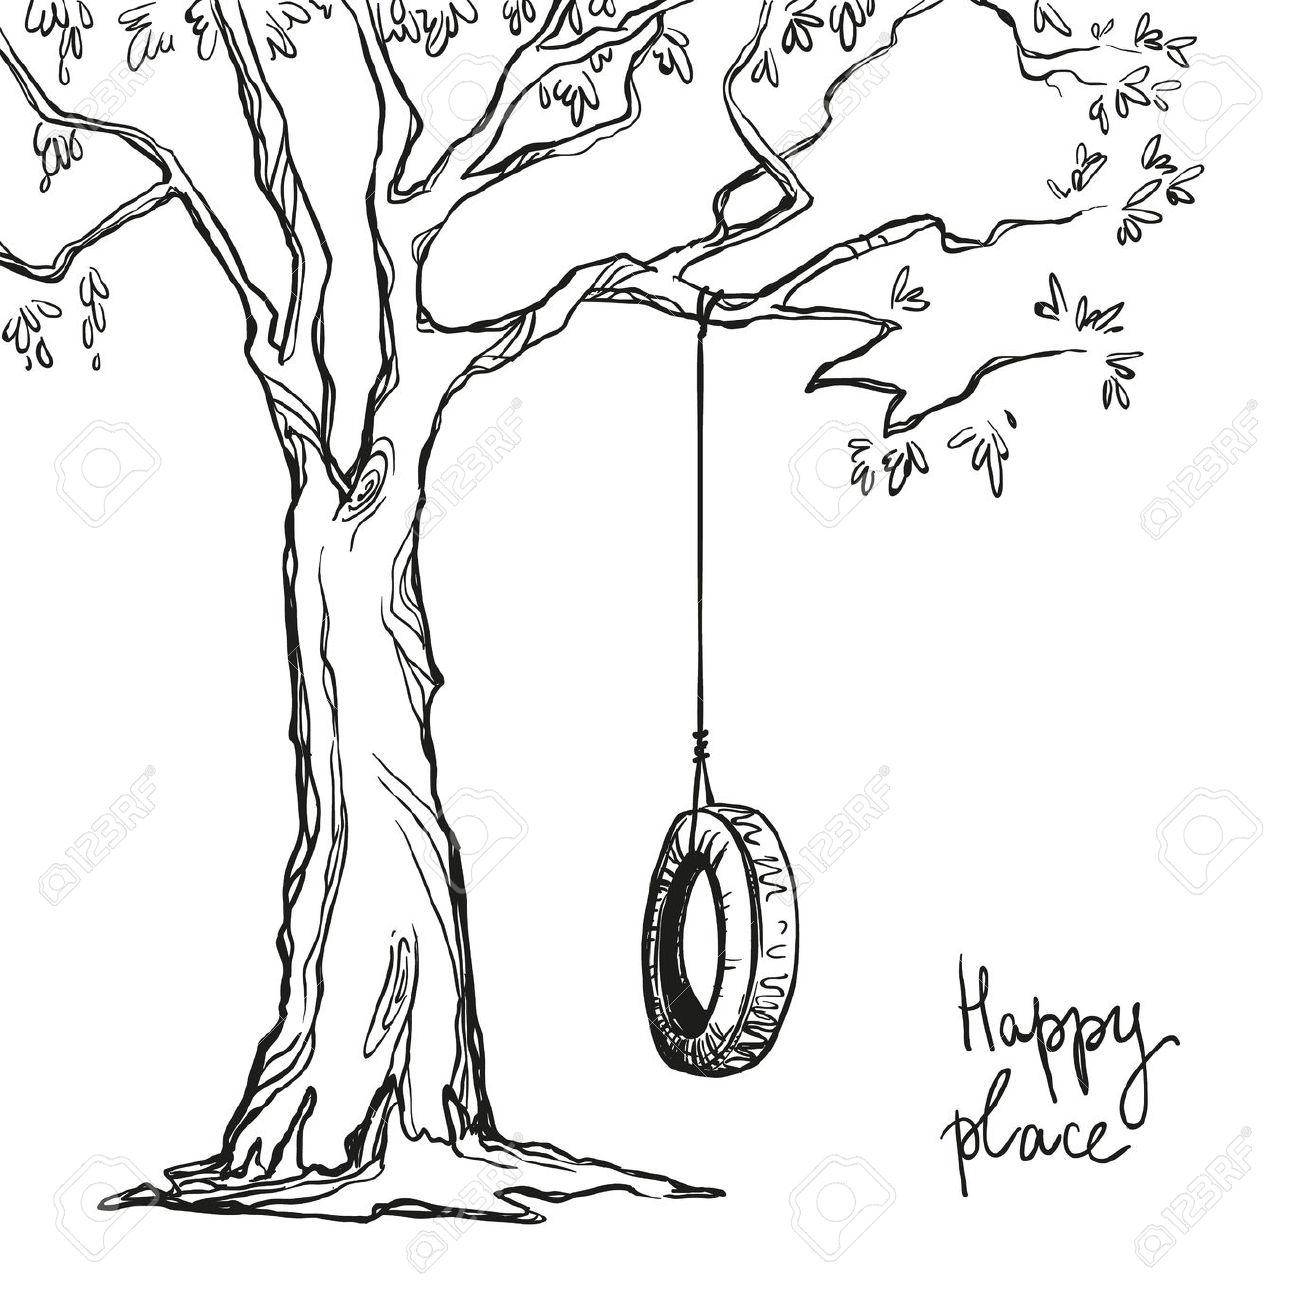 1300x1298 Tyre Swing Tree Drawing Inspo Tattoos